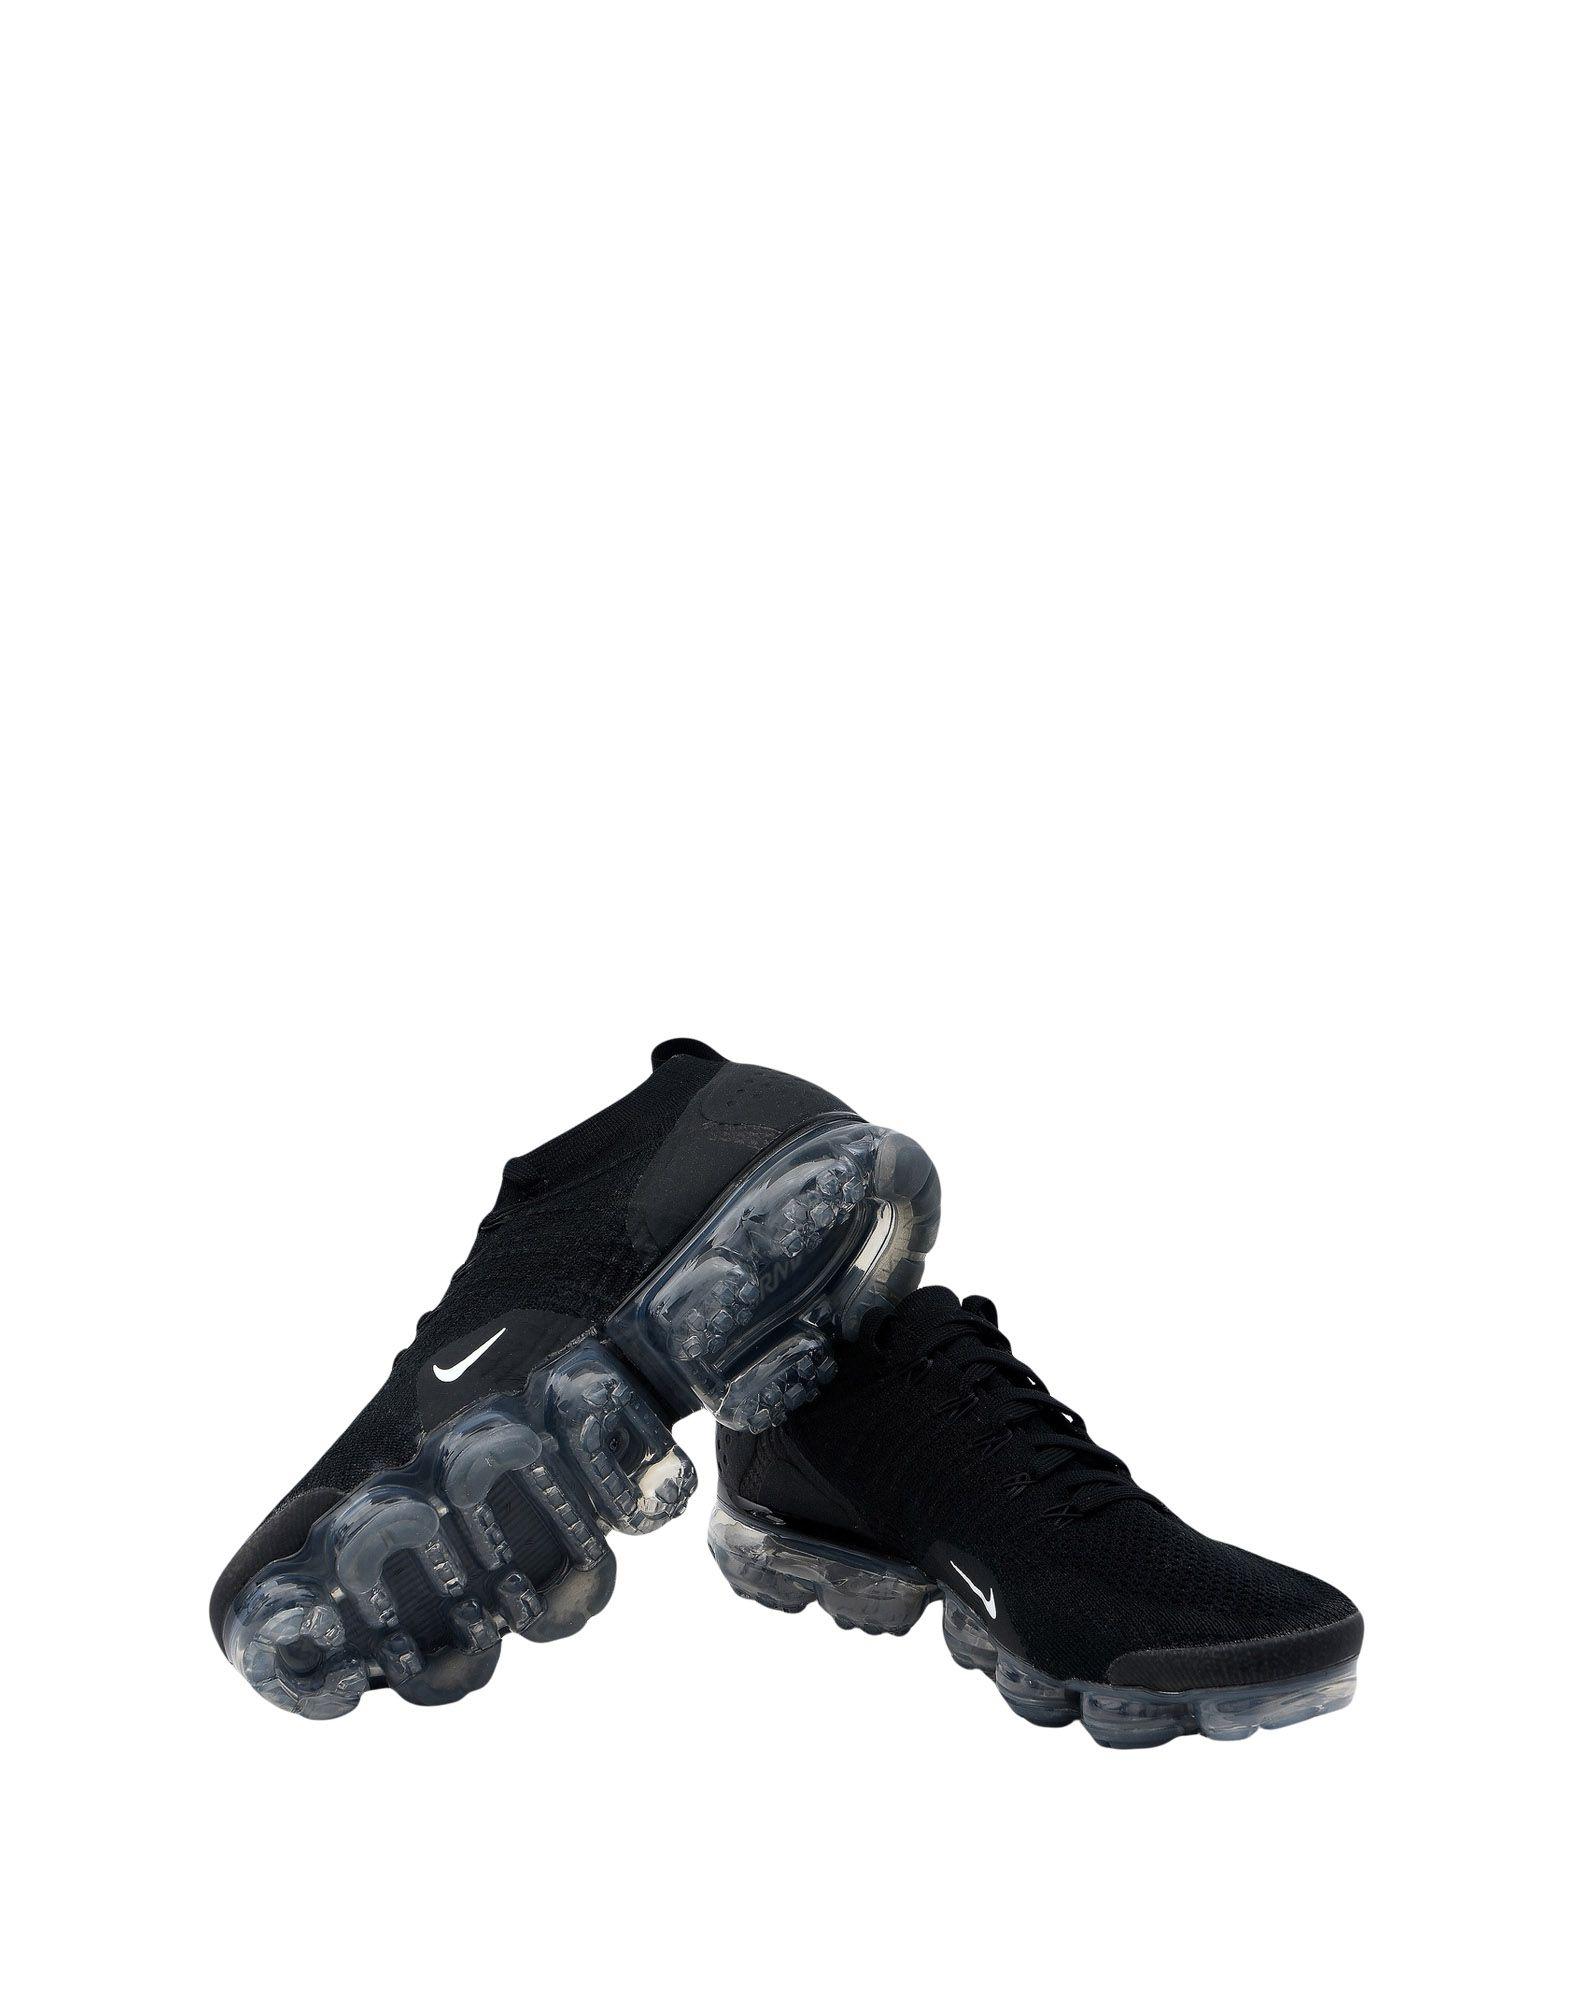 Sneakers Nike Nike Air Vapormax Flyknit 2 - Uomo - 11475102DW